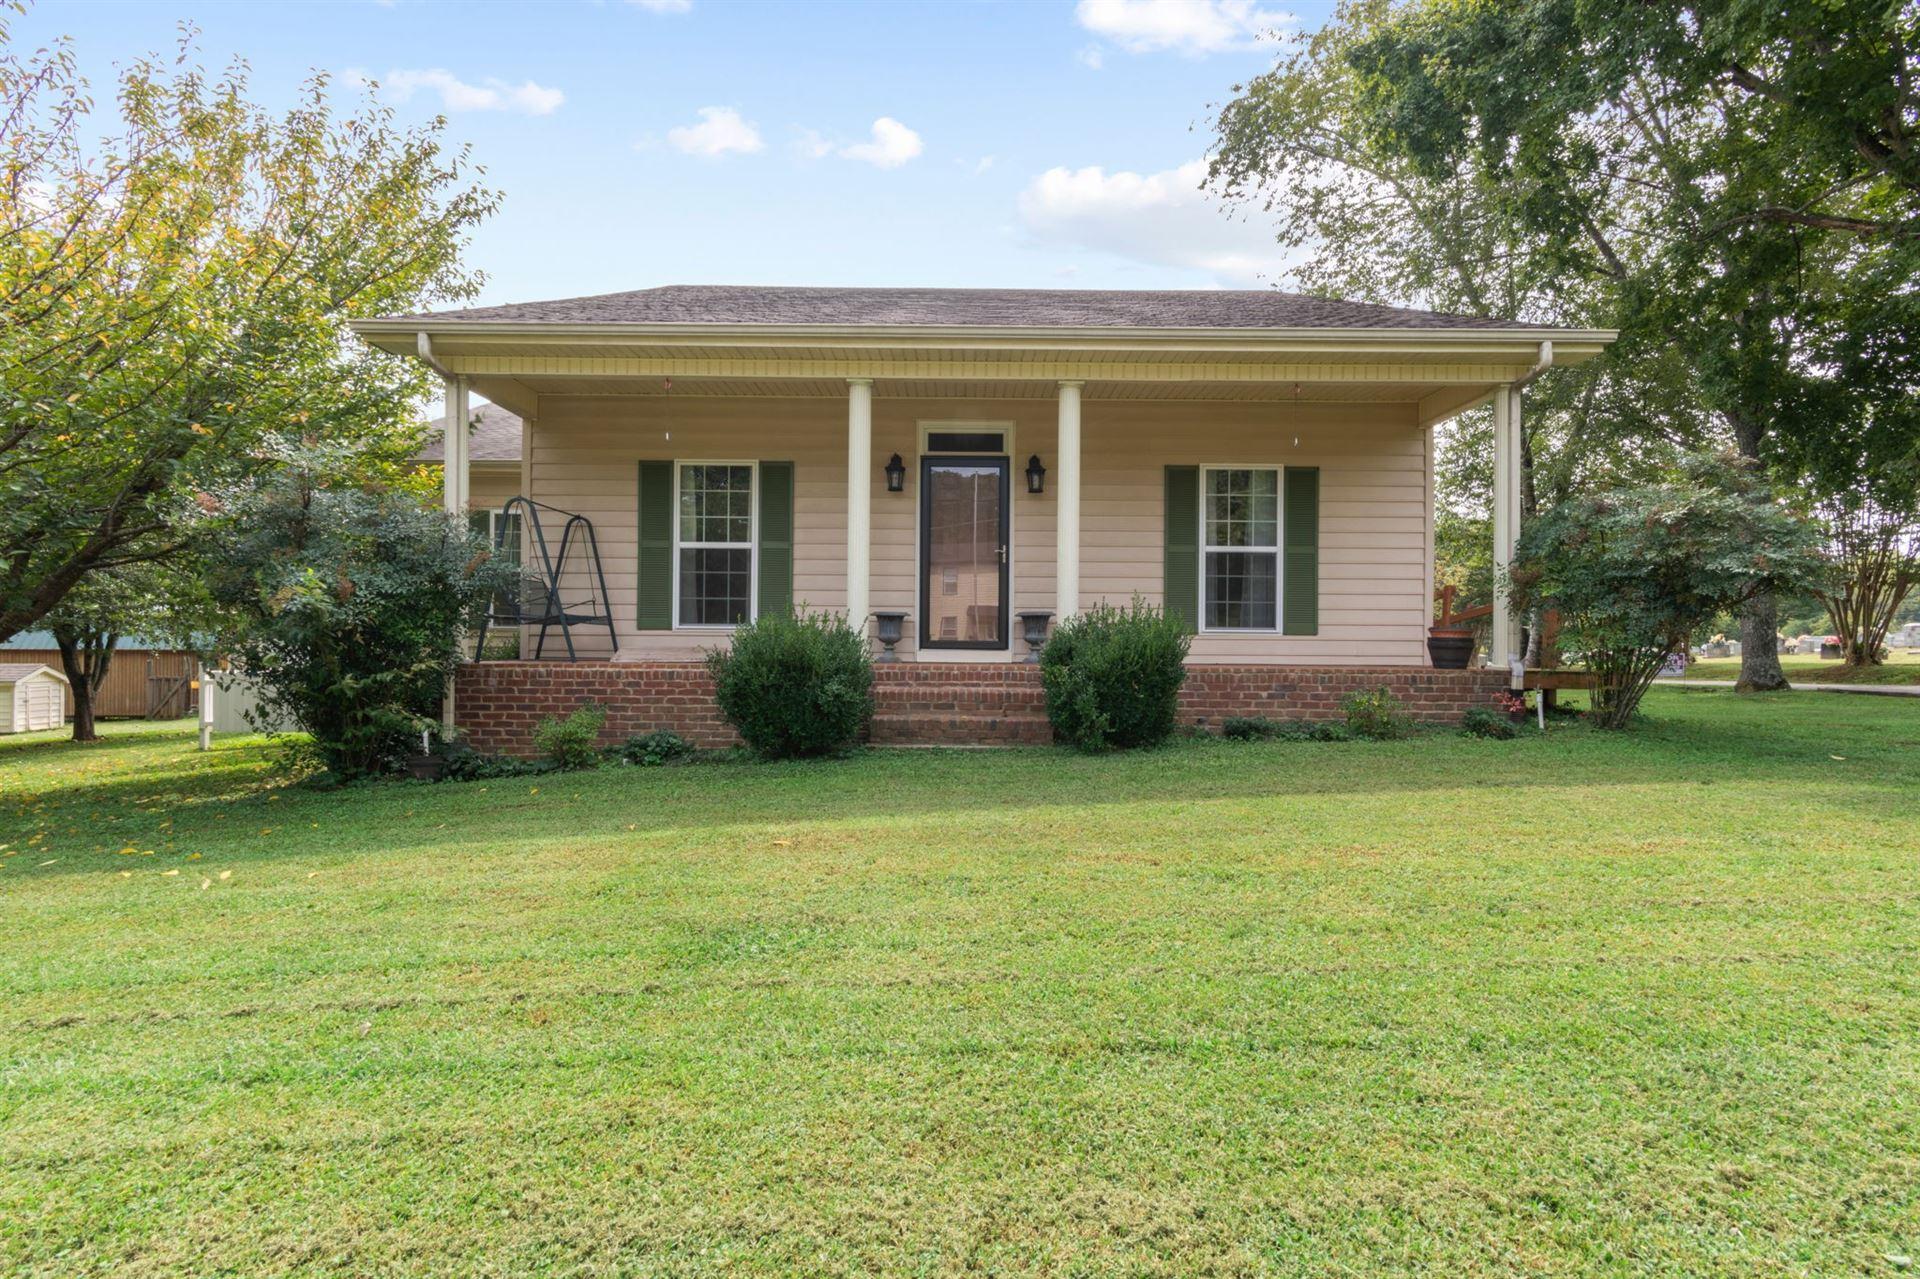 117 Wiggins Ave, Lynchburg, TN 37352 - MLS#: 2190336